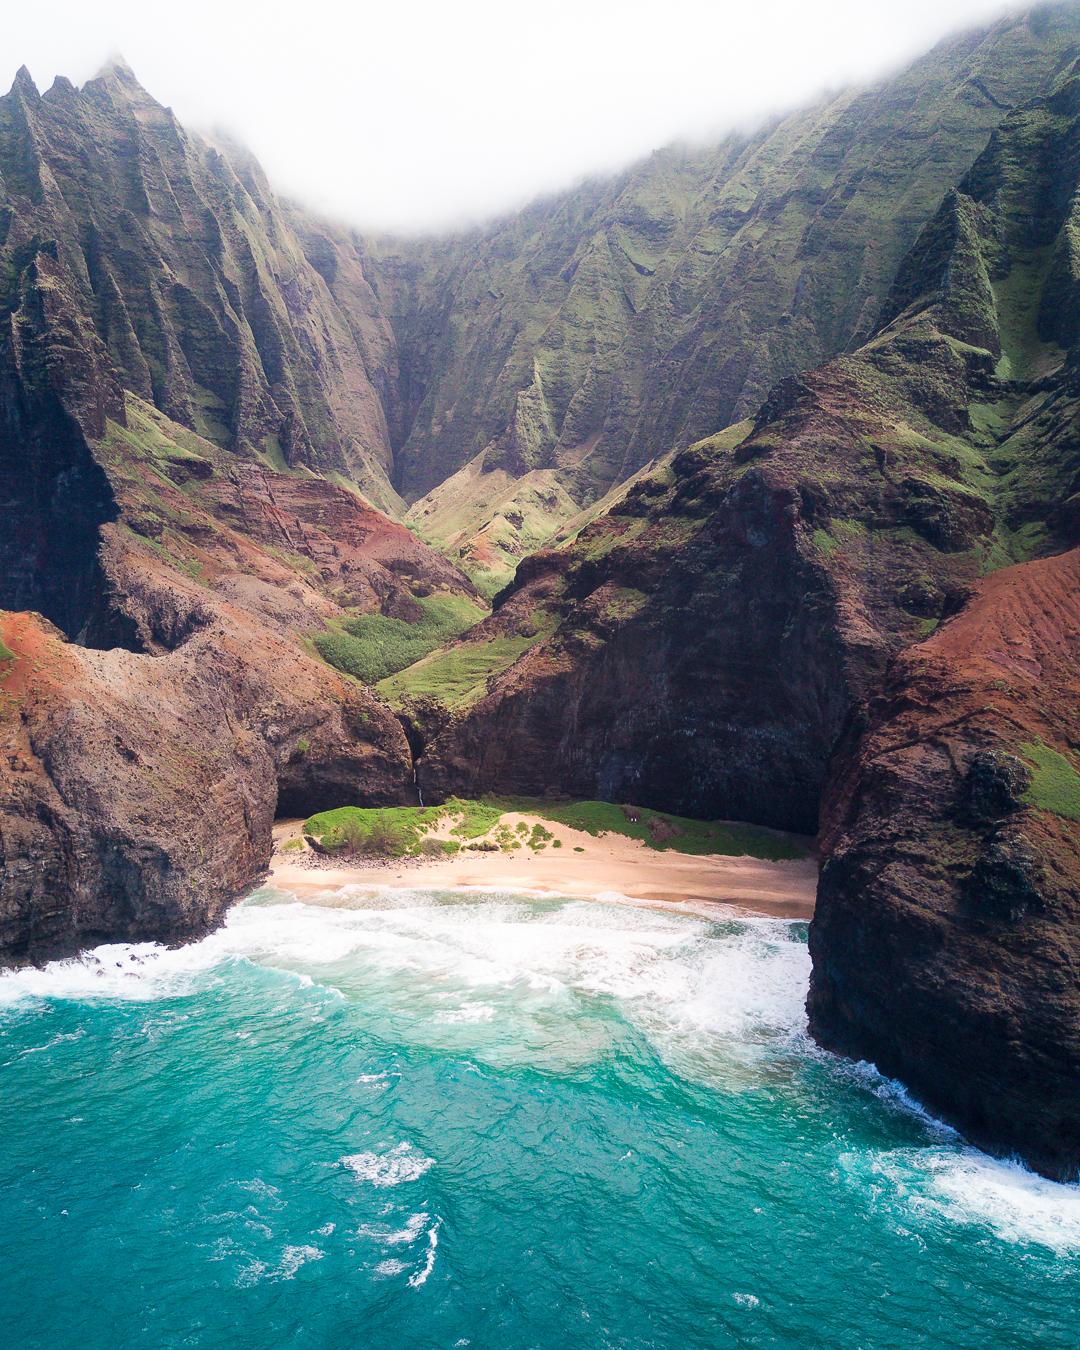 Areal views of the Na Pali Coast in Kauai.